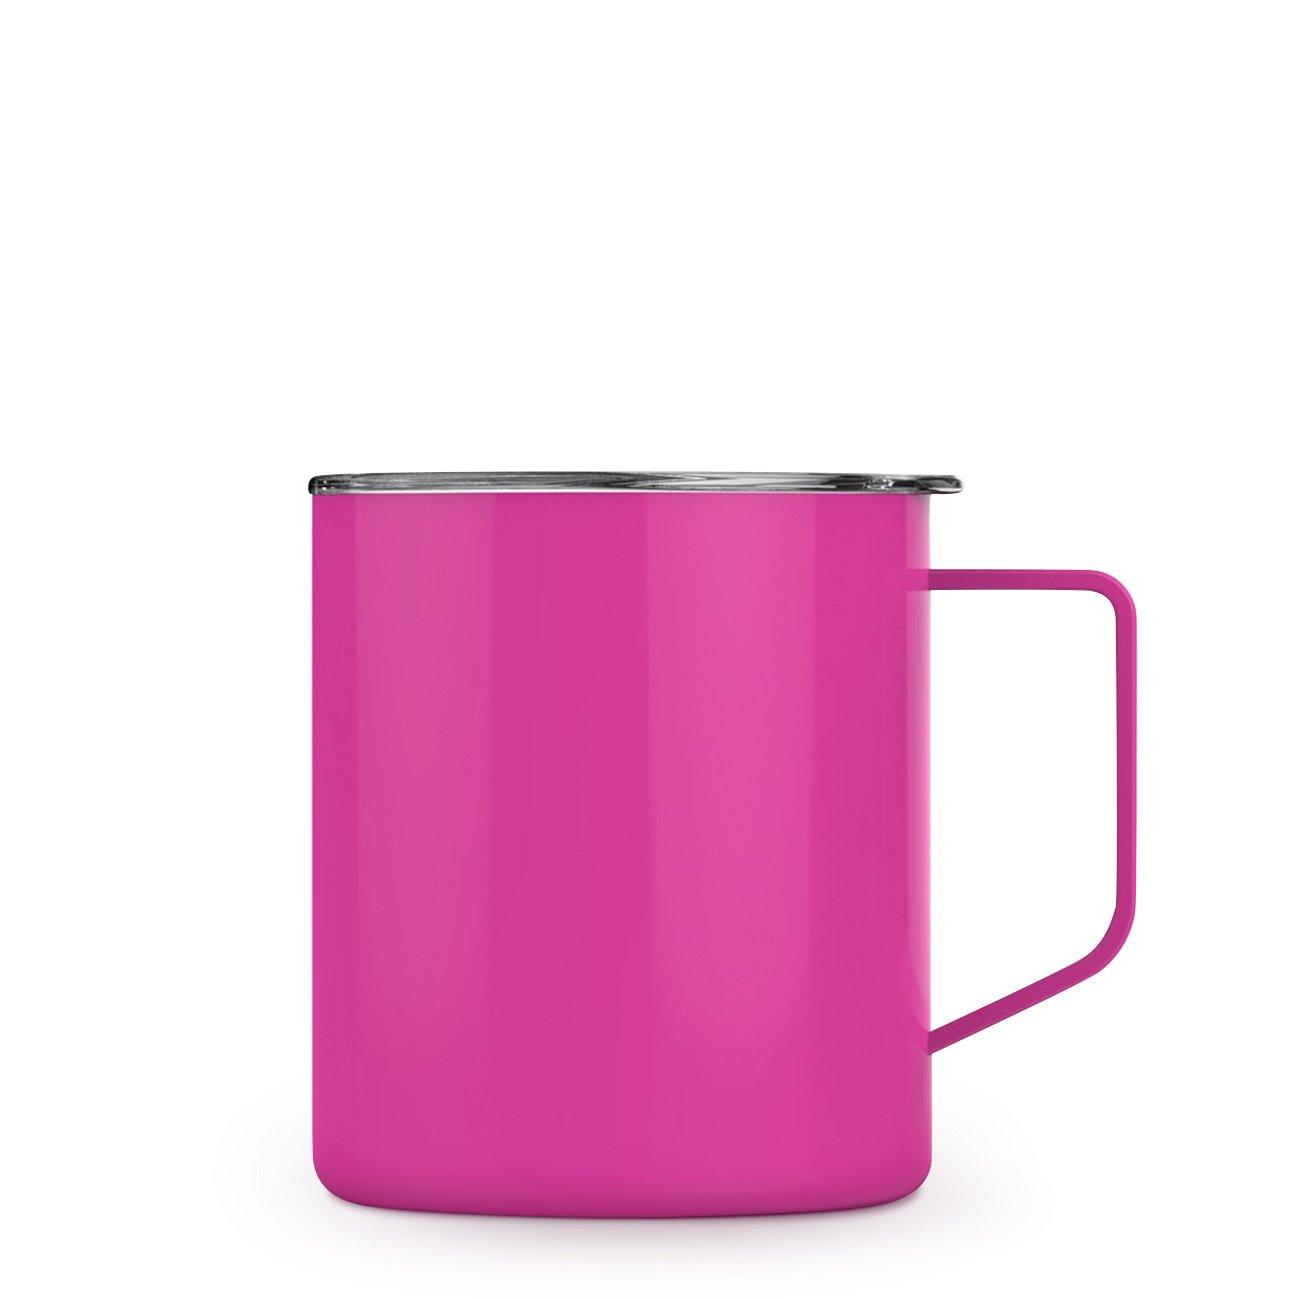 Maars Townie Insulated Coffee Mug, 14 oz   Double Wall Vacuum Sealed Camp Cup - Fuchsia